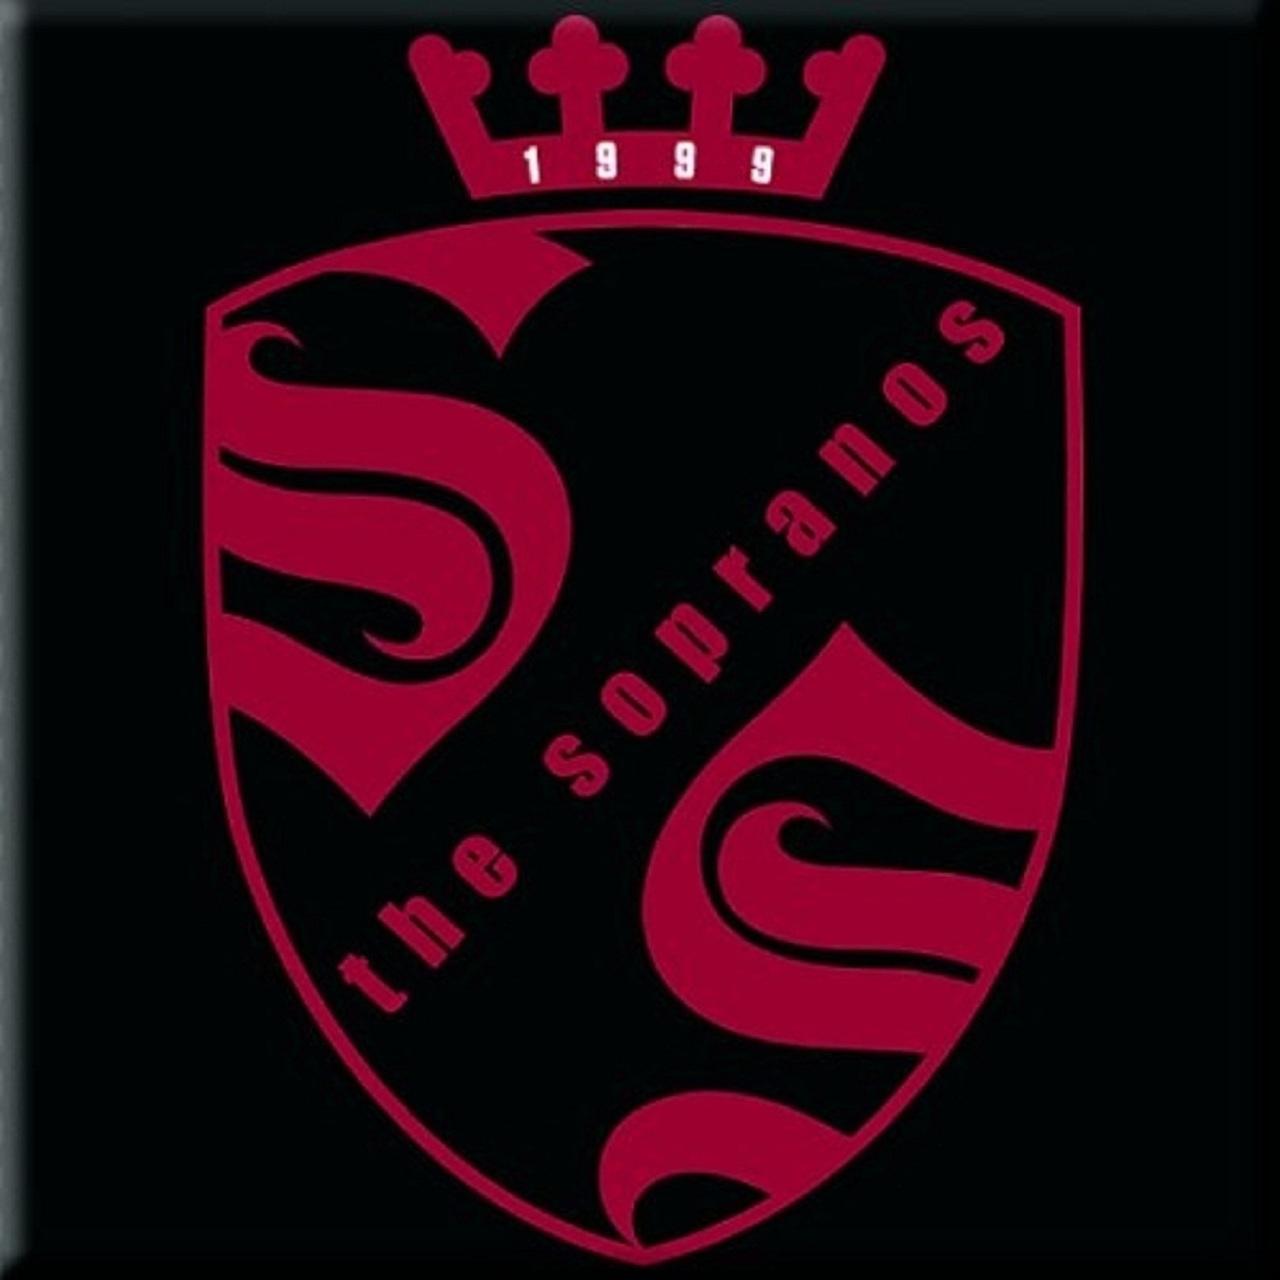 The Sopranos Crest Logo 76mm x 76mm Fridge Magnet.